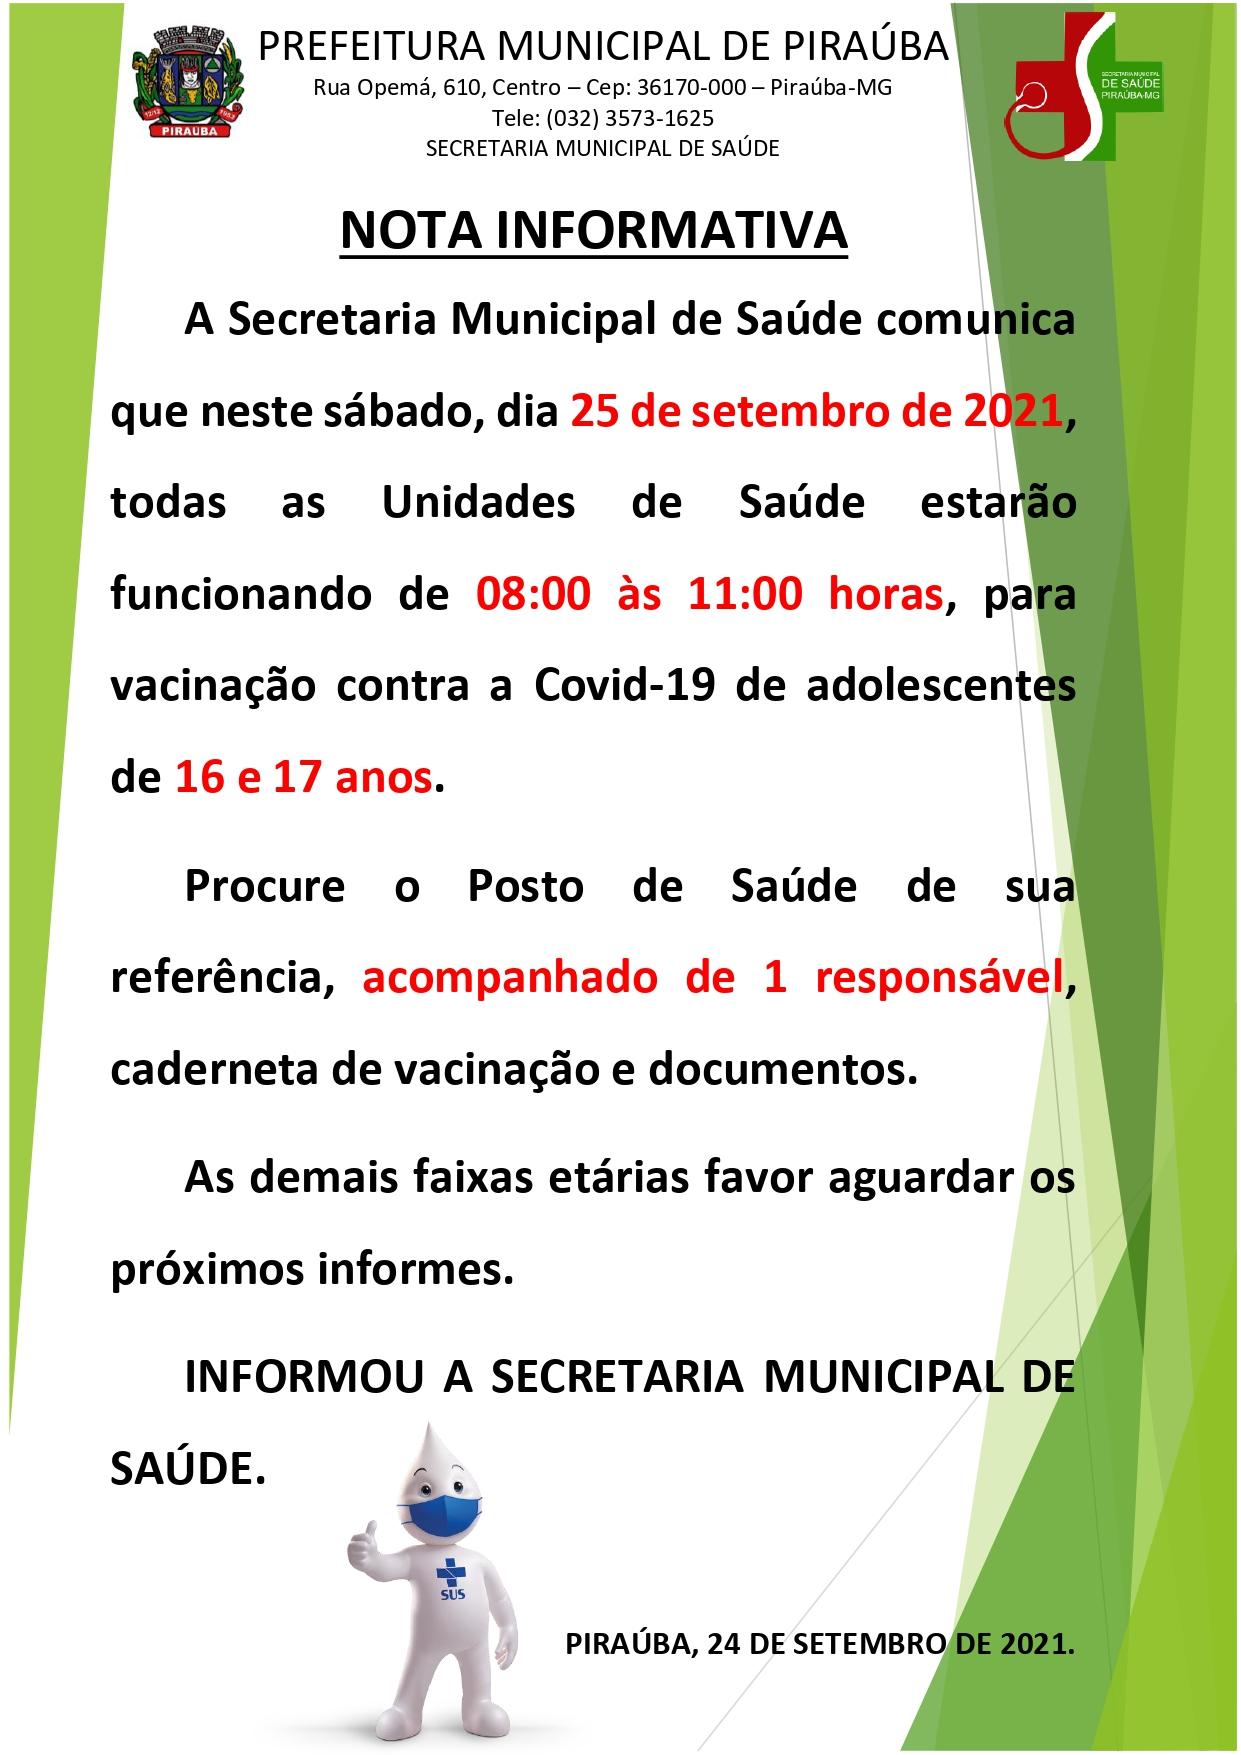 NOTA INFORMATIVA VACINAS COVID-19 (Adolescentes) - SMS PIRAÚBA